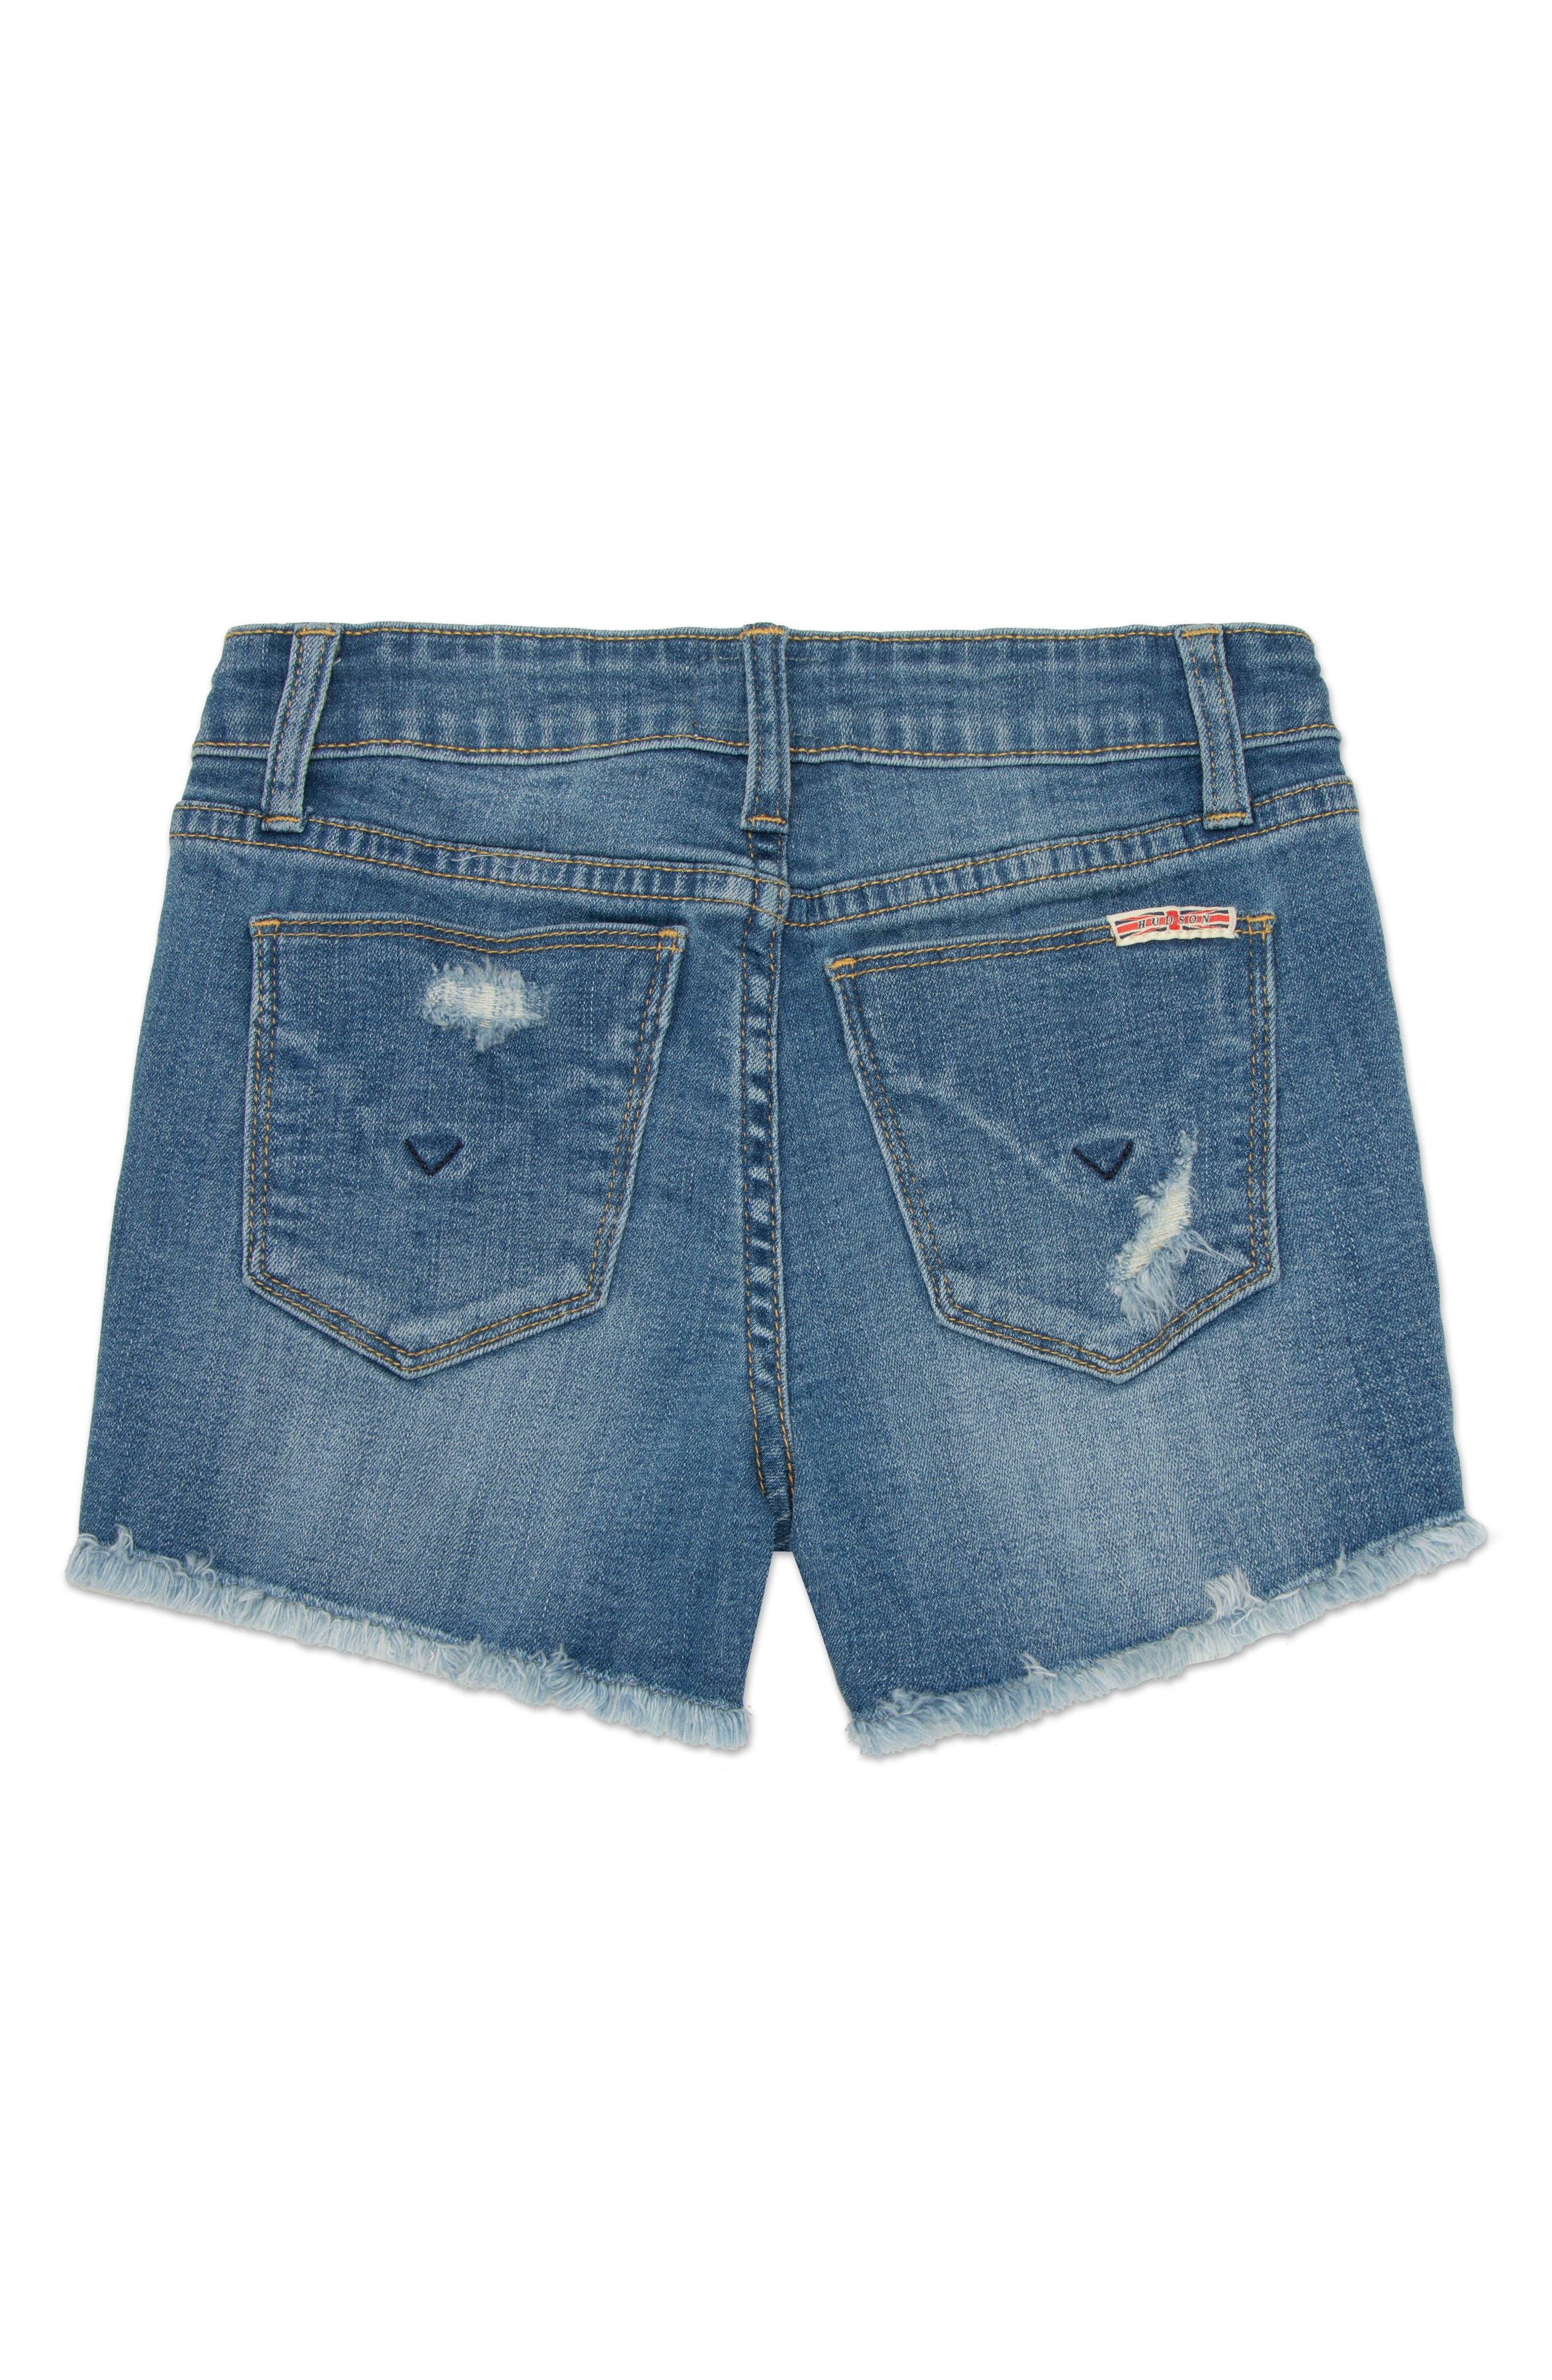 Frayed Shorts,                             Alternate thumbnail 2, color,                             498